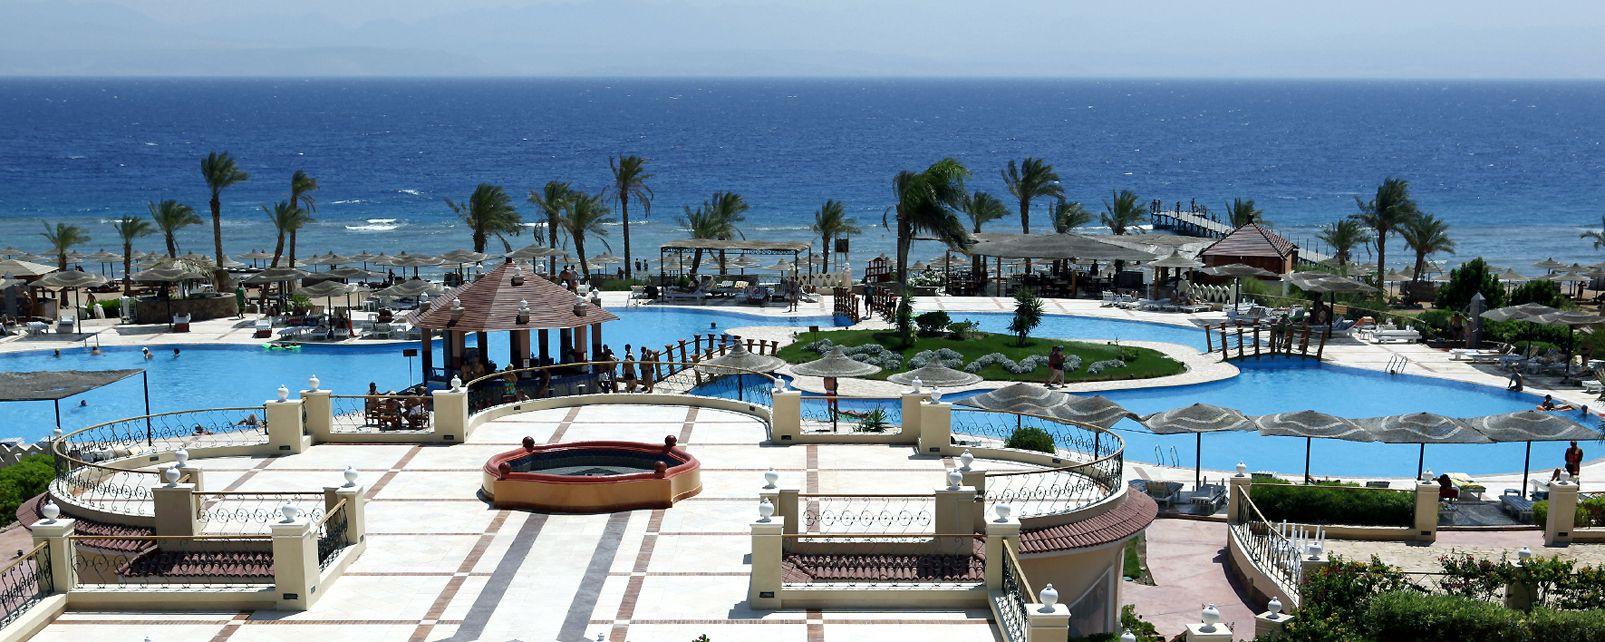 Hotel Morgana Beach Resort Taba